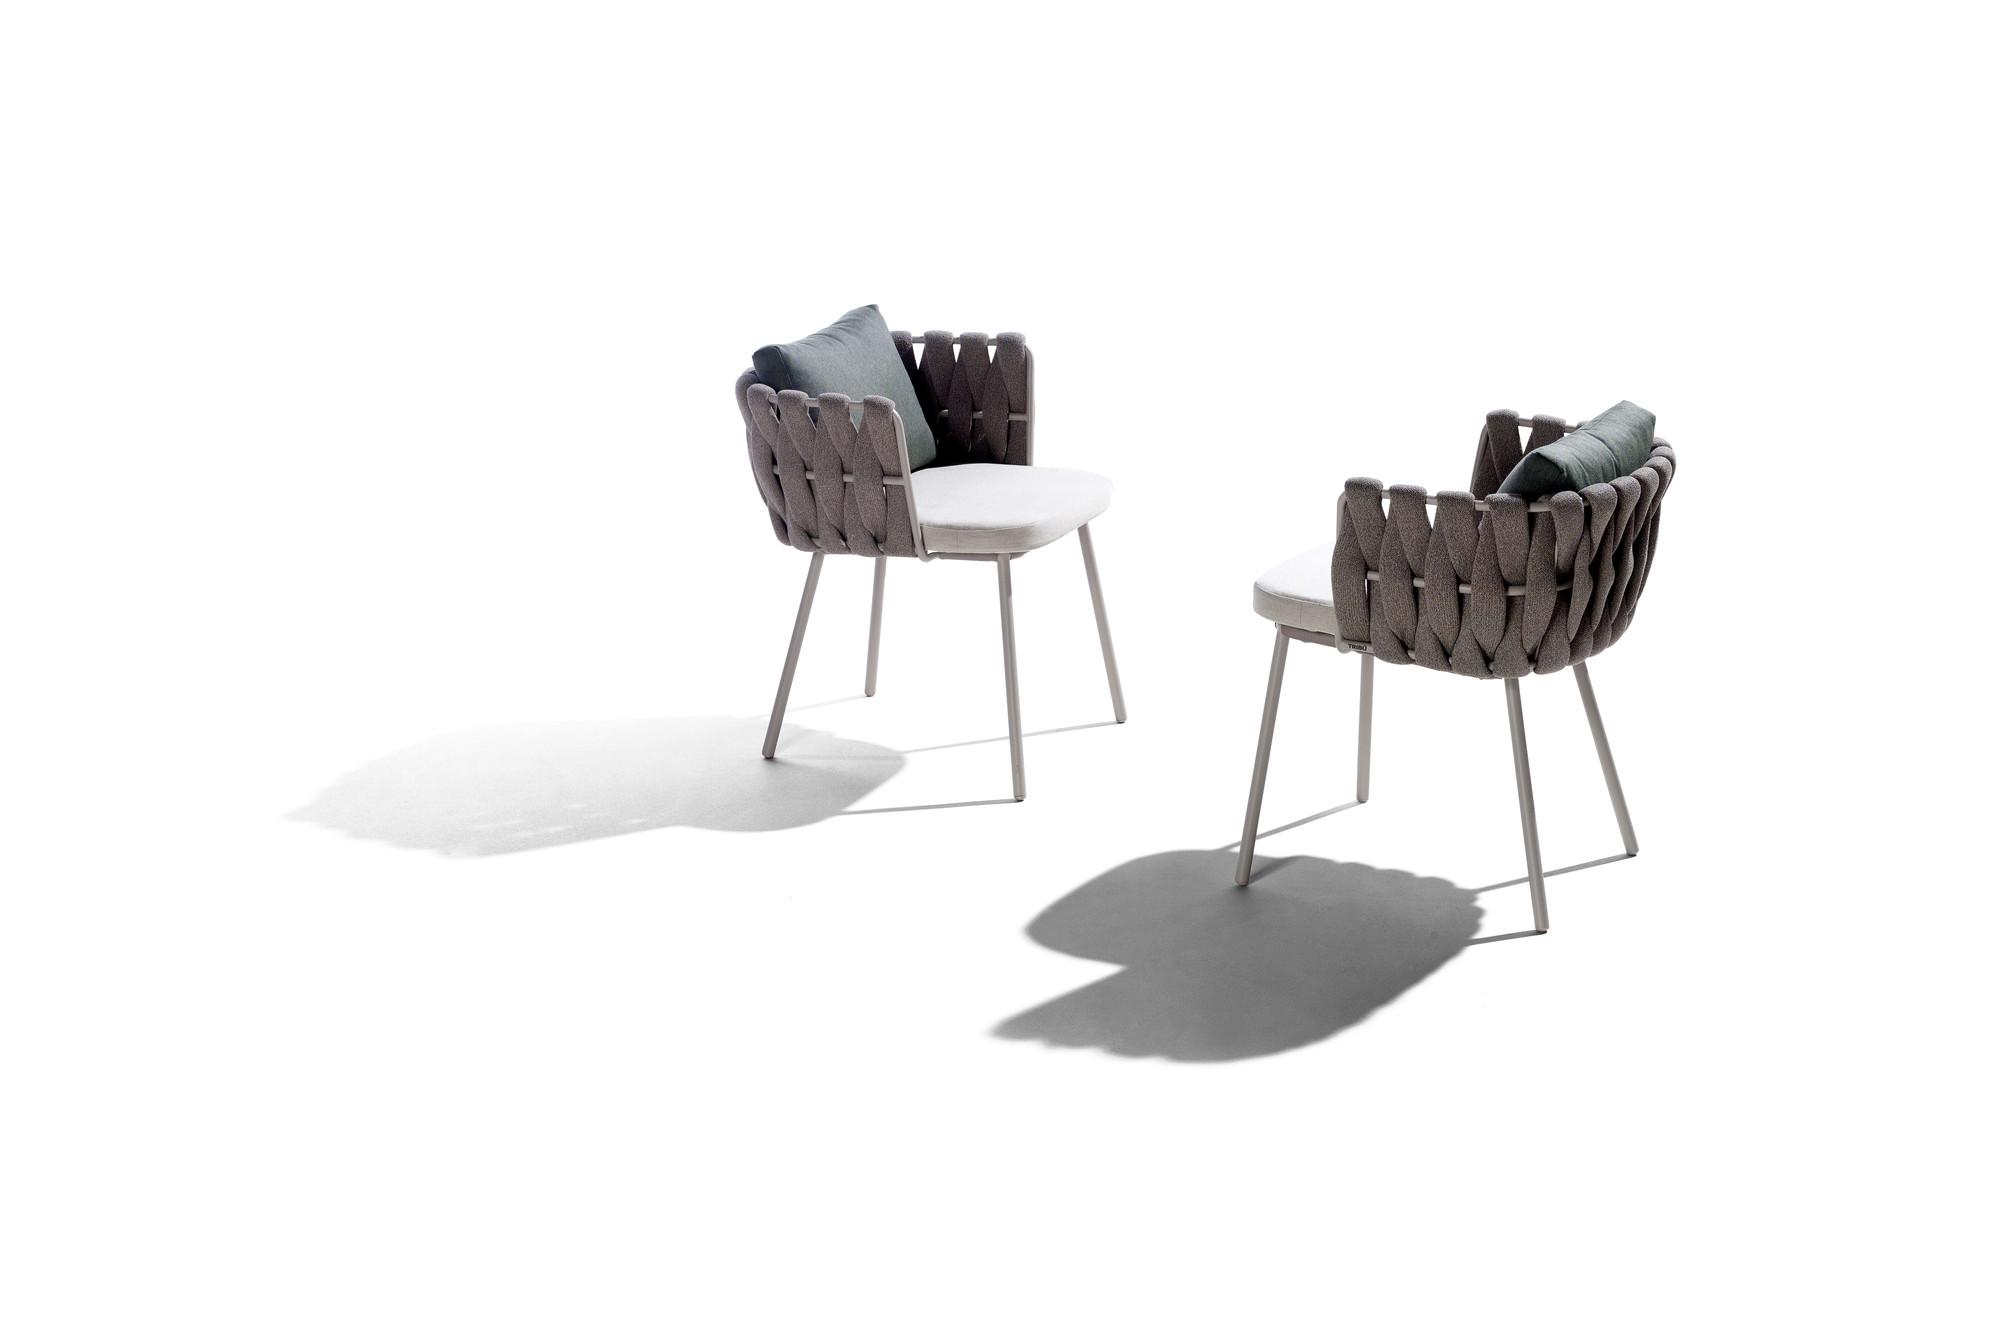 innenarchitektur | höttges interior design | dornbirn